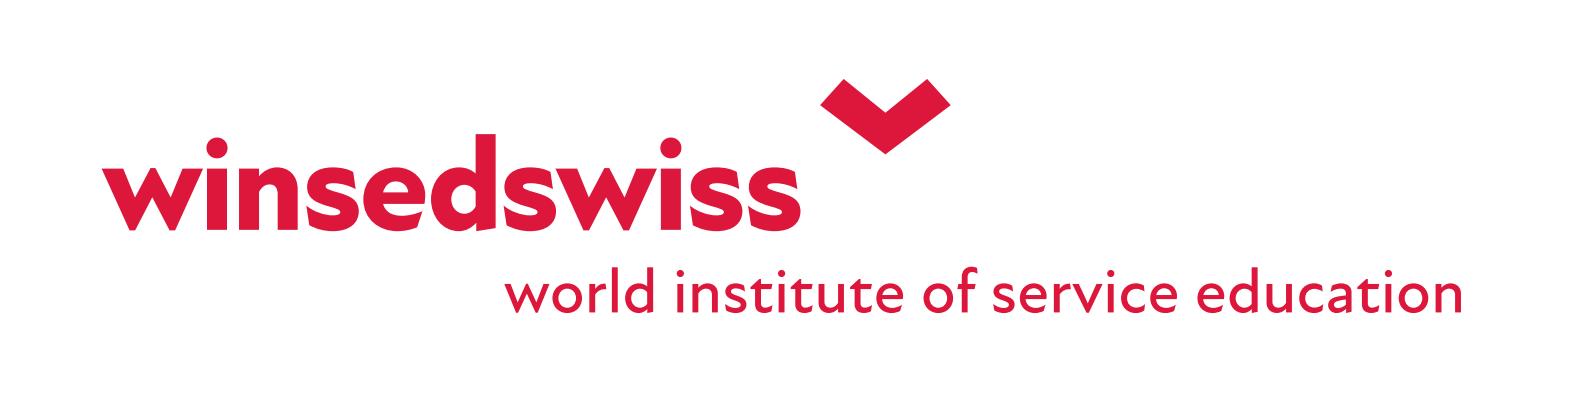 winsedswiss - world institute of service education